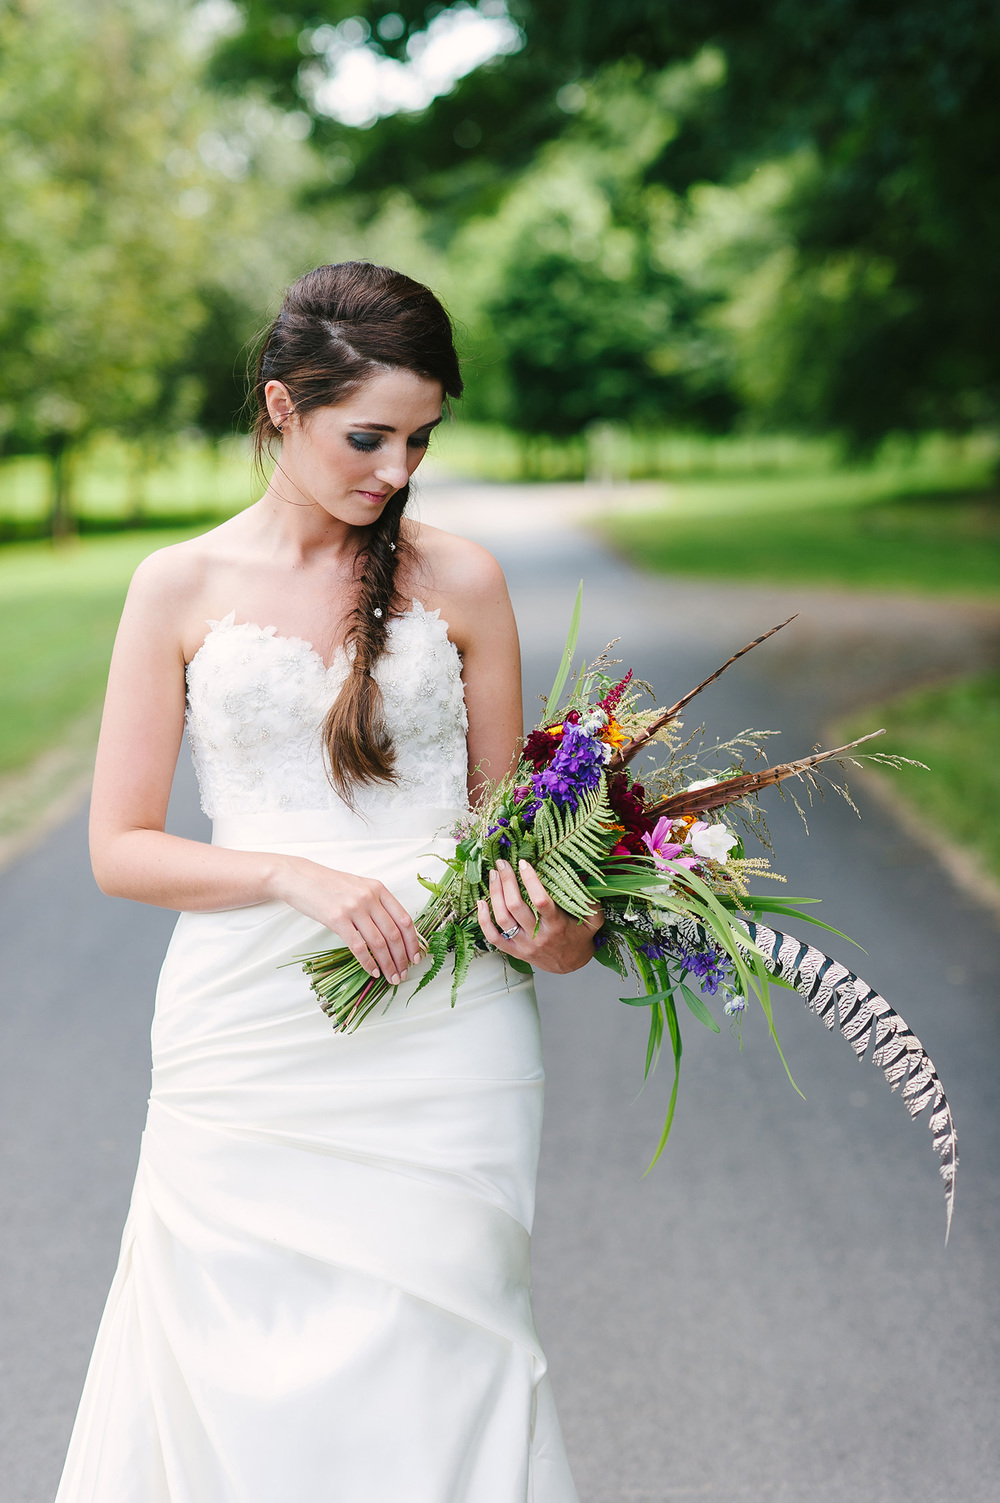 Irish Wedding Photographers Bellinter House Wedding Holly and Barry 113.JPG